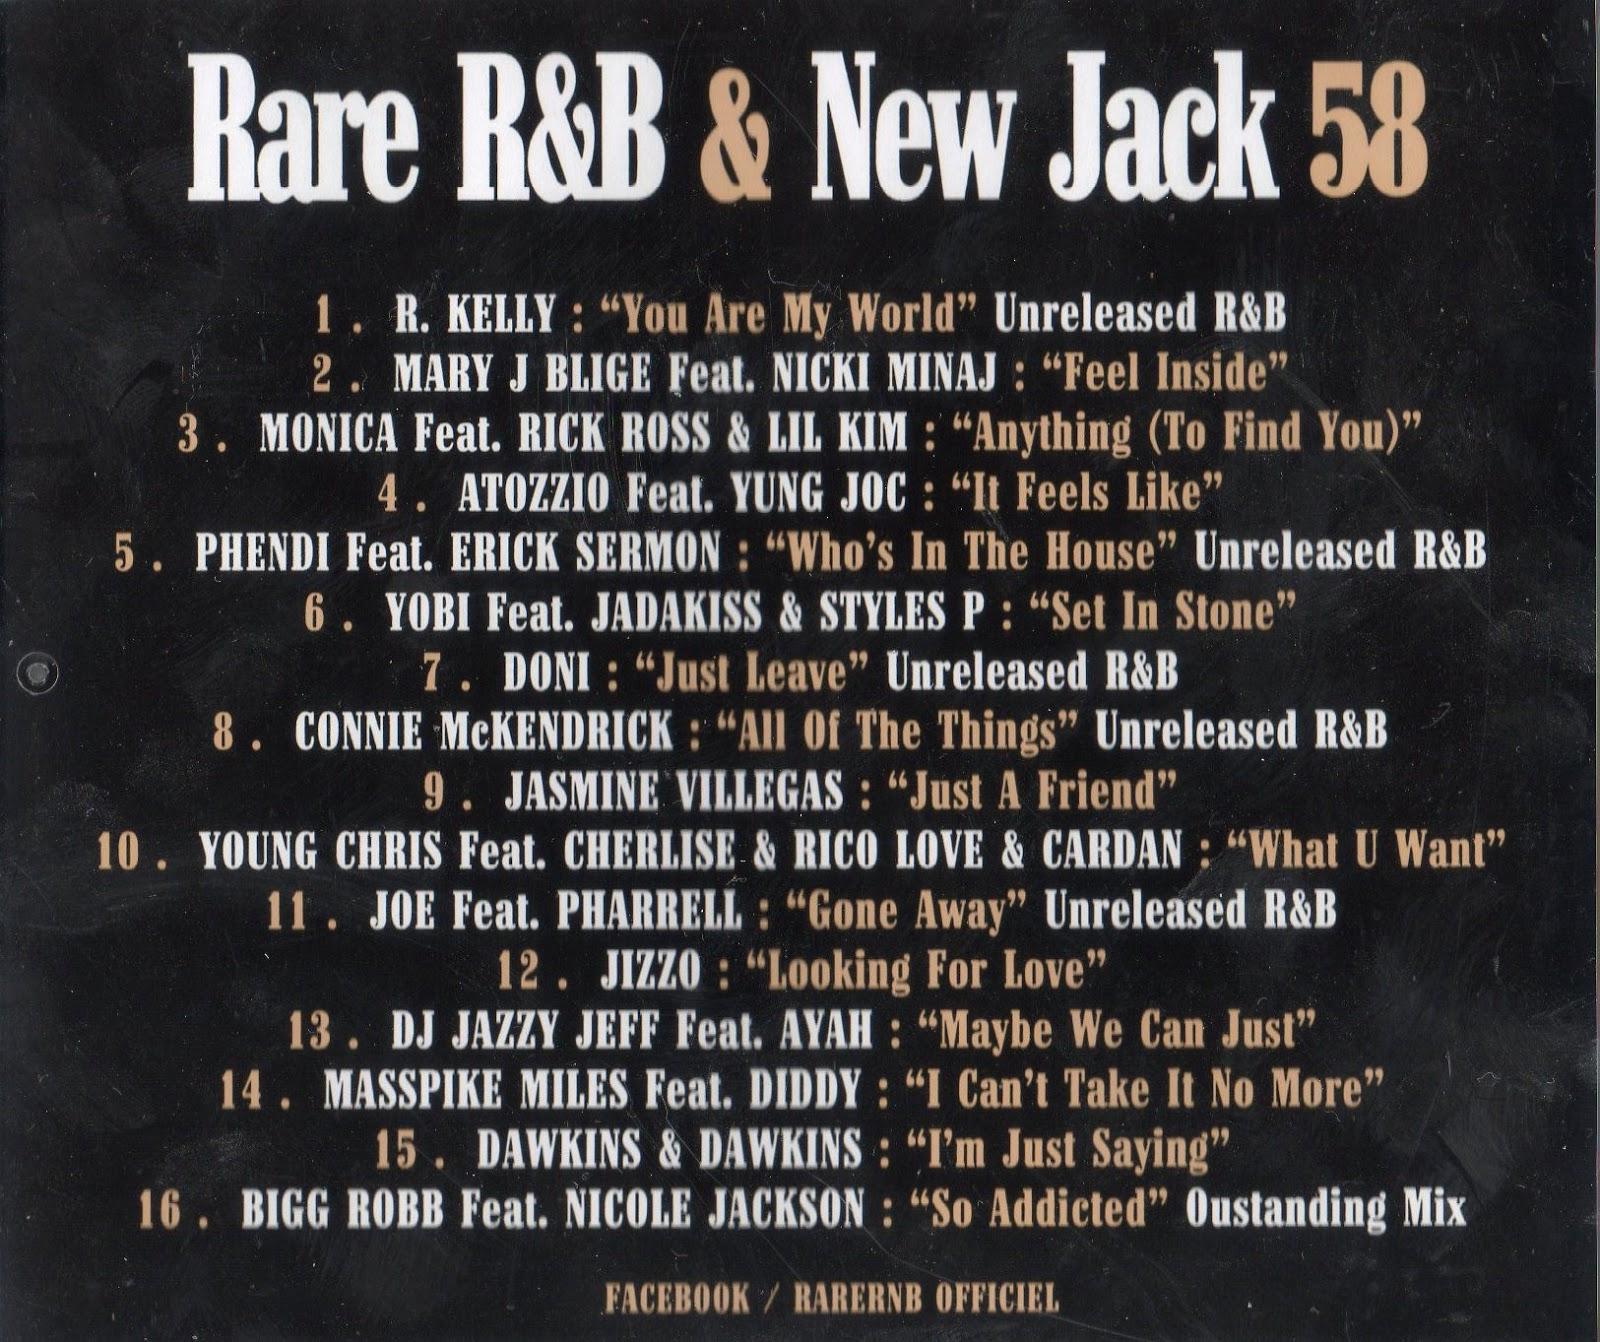 NEW R&B TÉLÉCHARGER JACK RARE